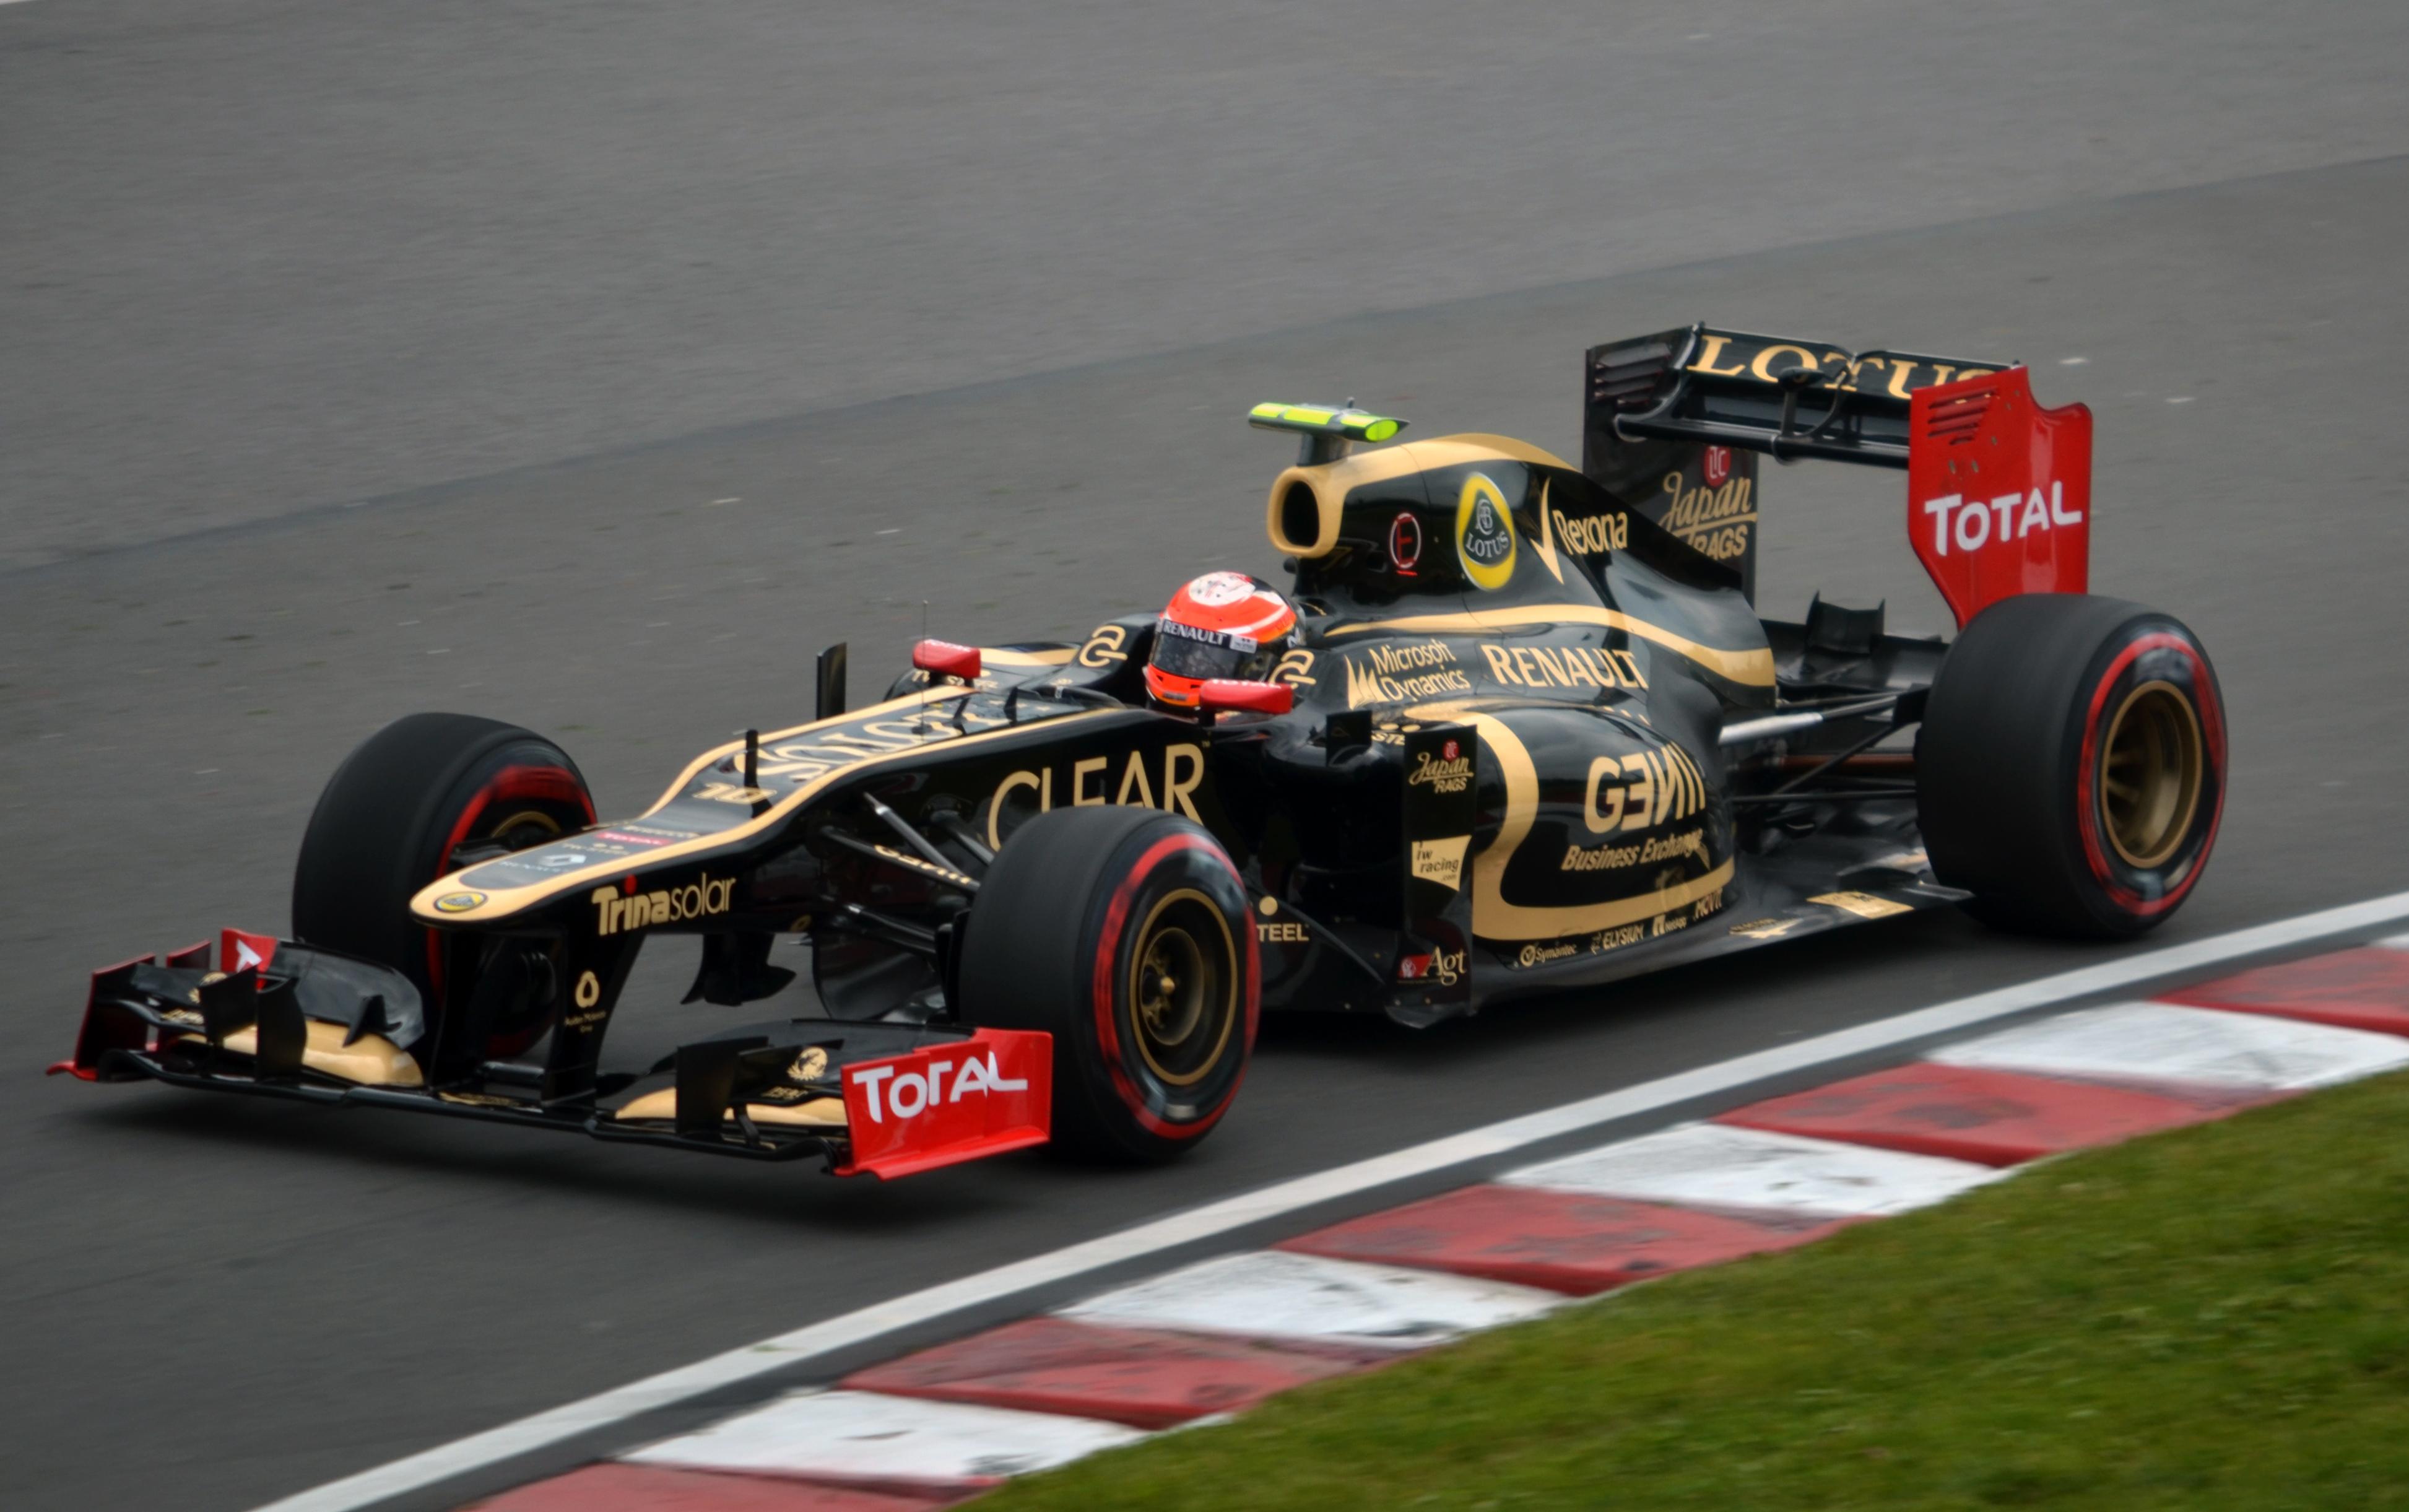 File 012 Canadian Gp Romain Grosjean Lotus E20 02 Jpg